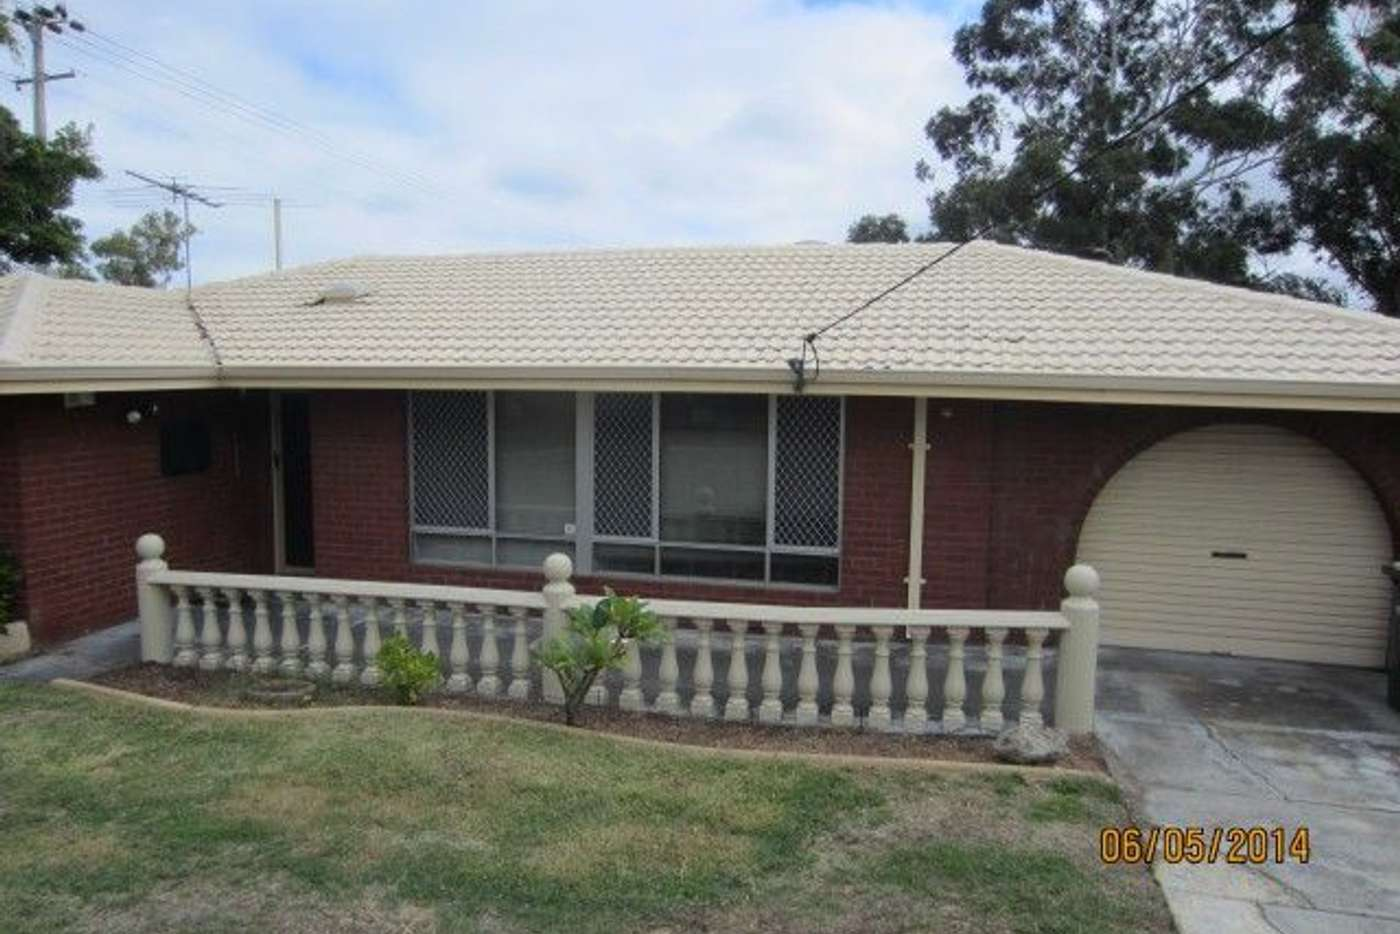 Main view of Homely house listing, 13 Ellison Drive, Padbury WA 6025